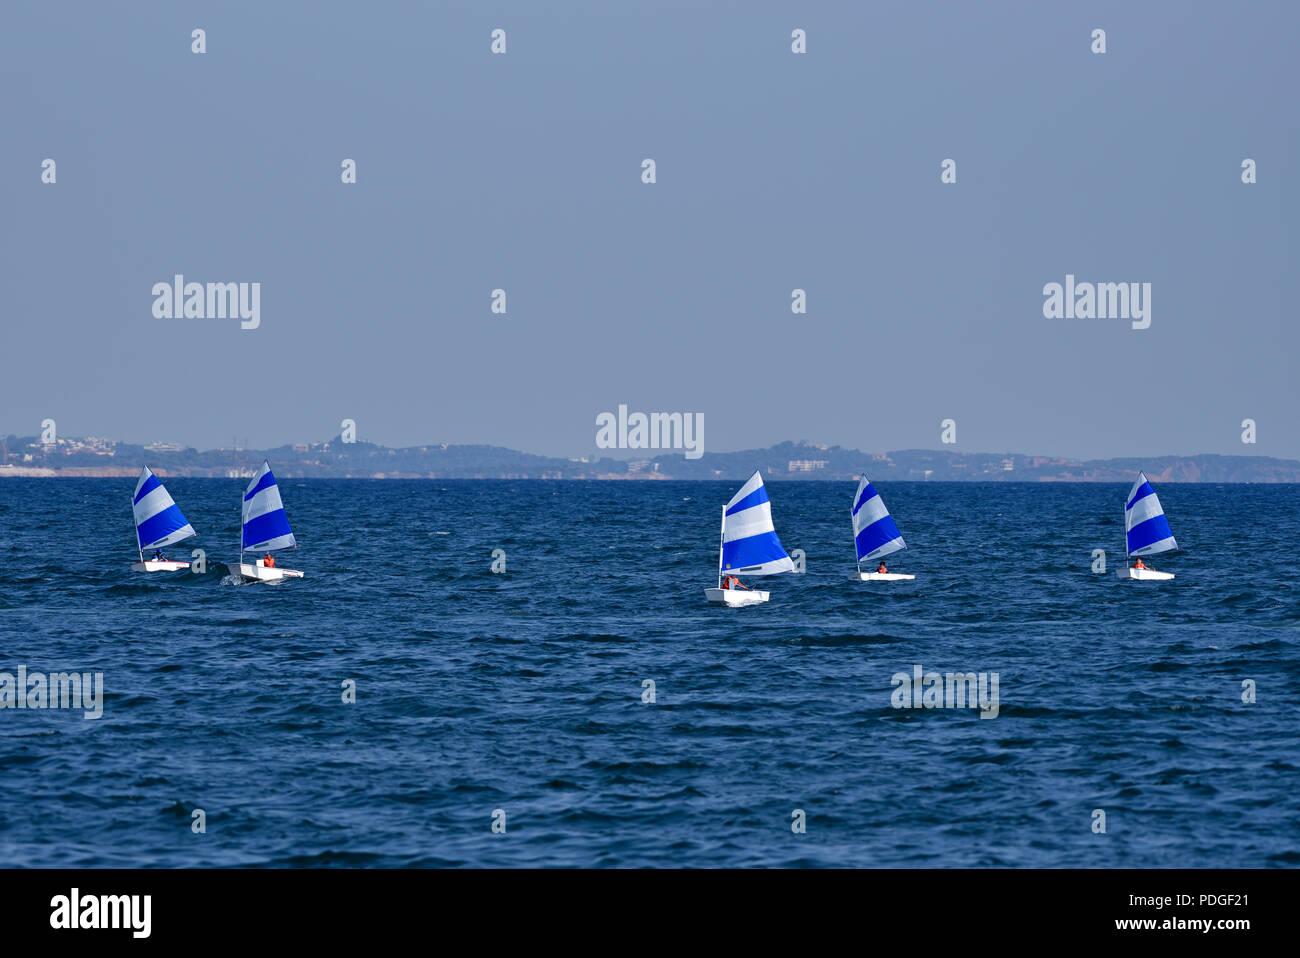 Optimist segeln Yachten in Faliro, Athen, Griechenland Stockbild